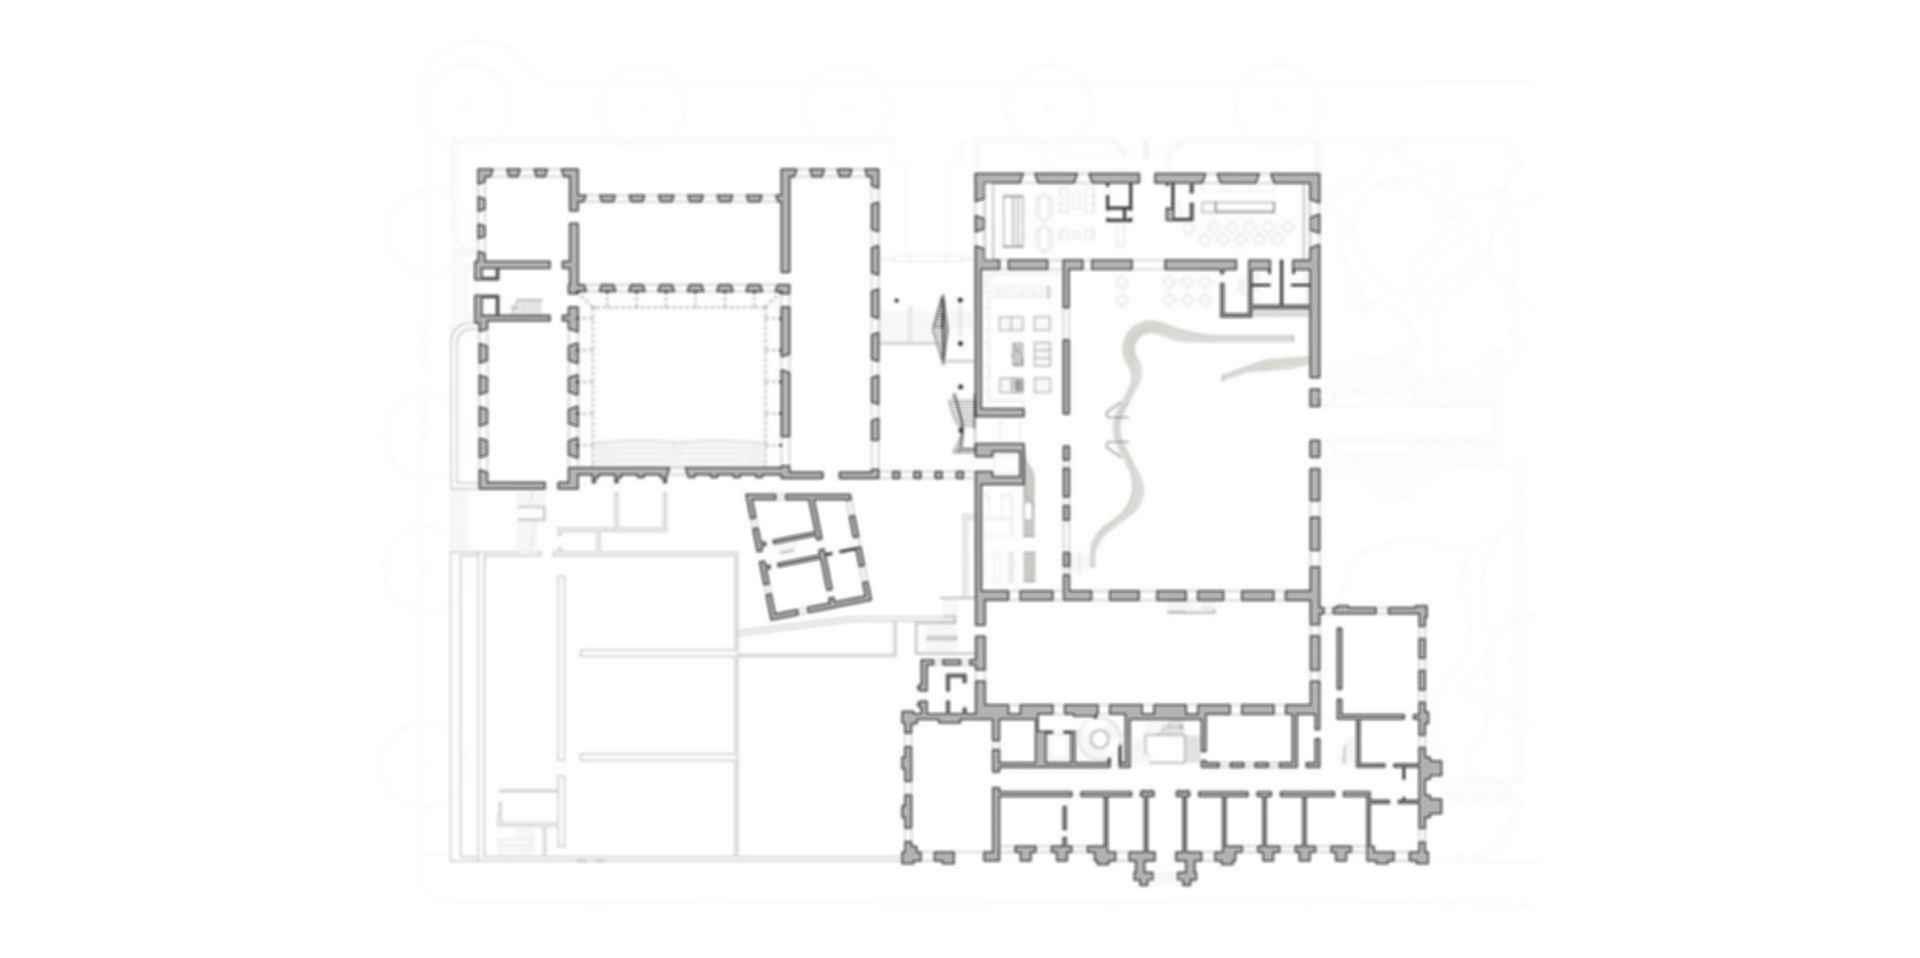 Tasmanian Museum and Art Gallery - Floor Plan